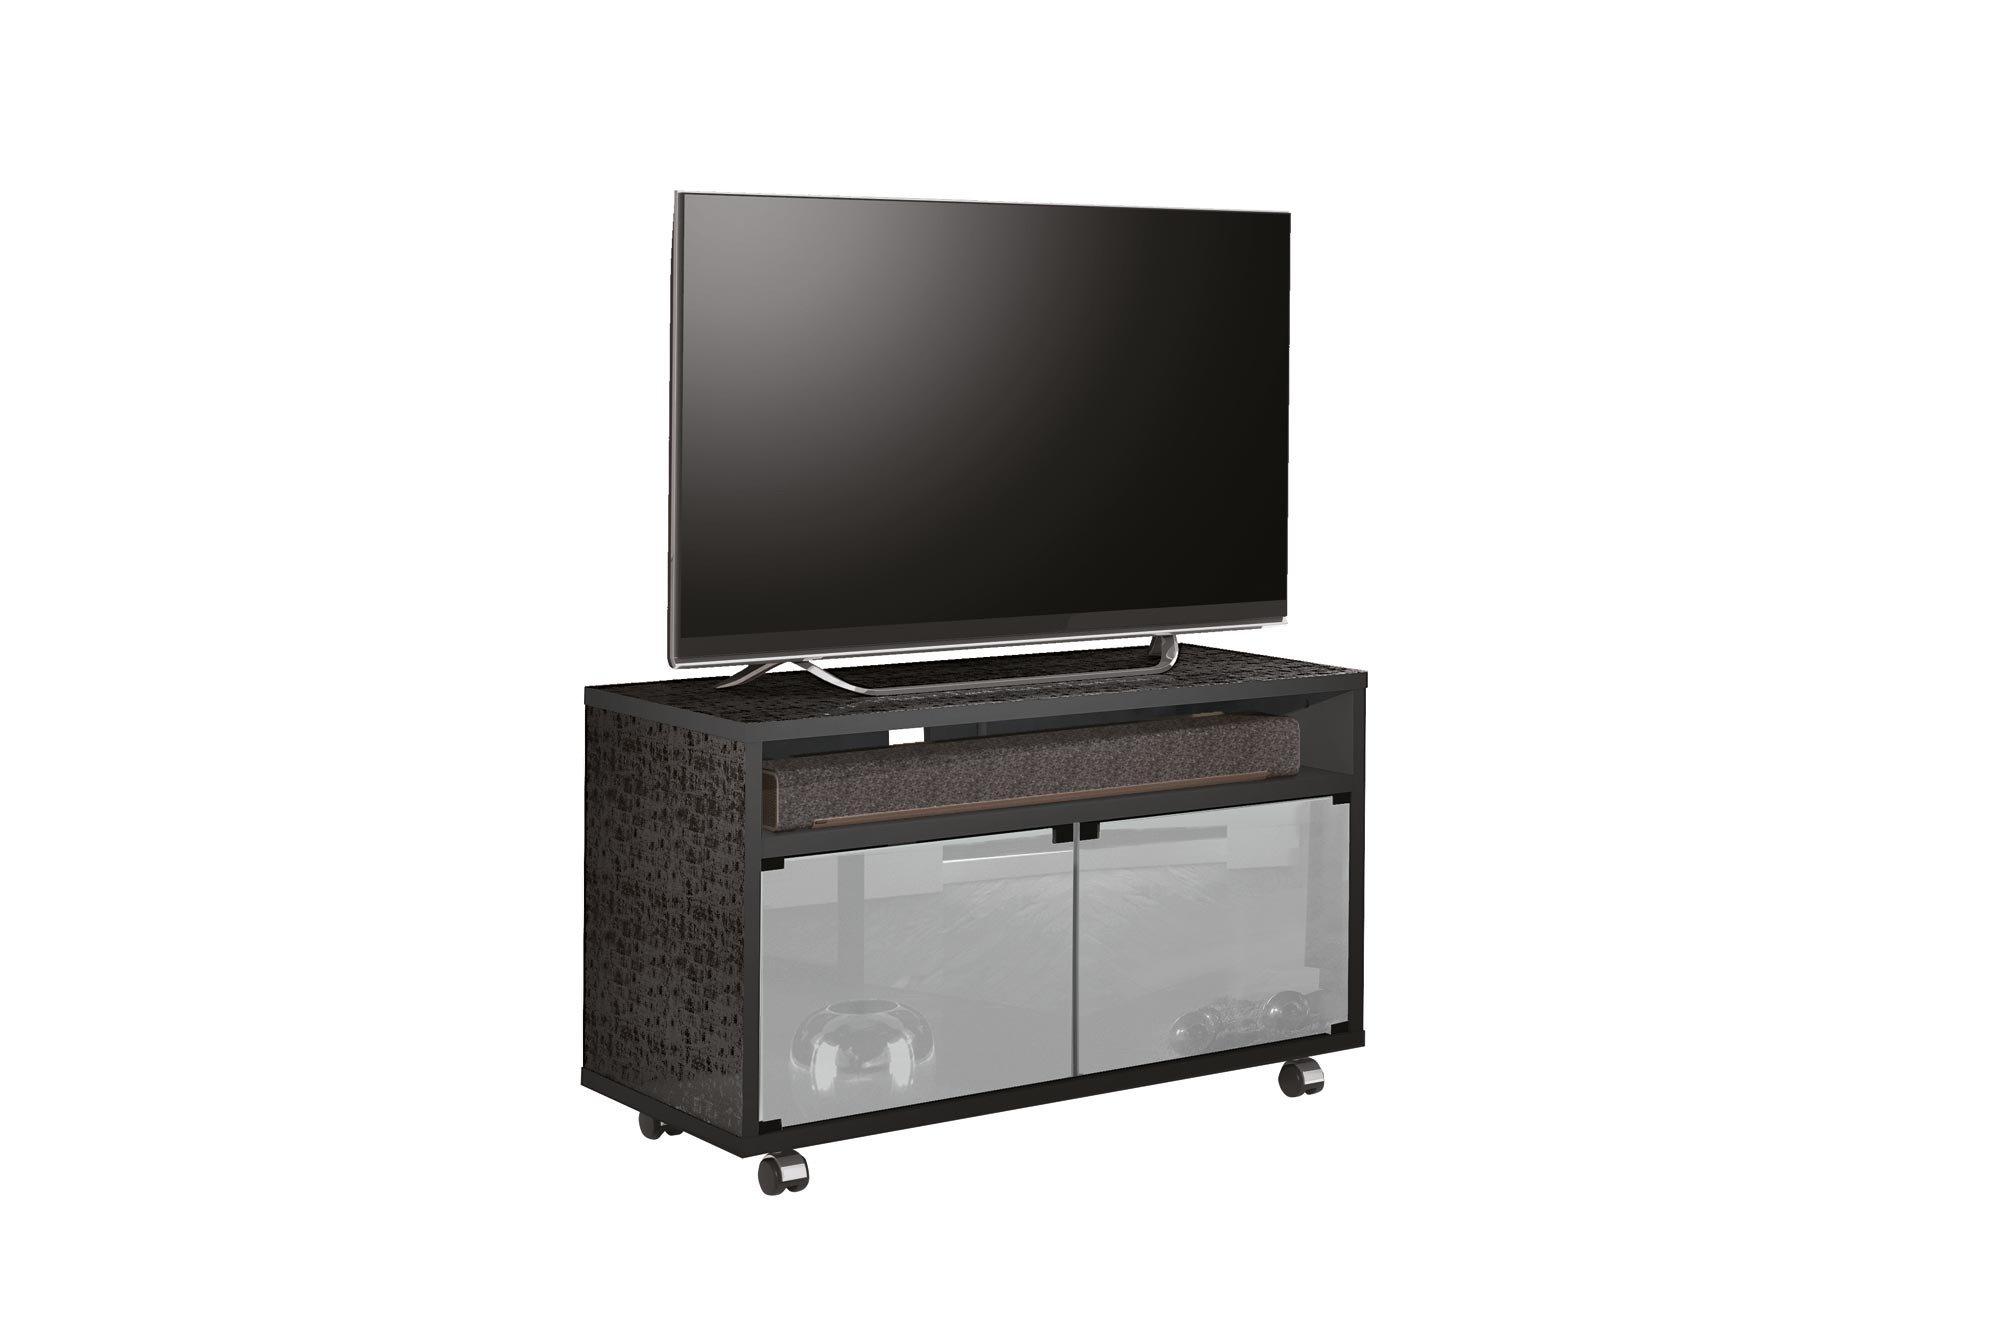 munari matera tv m bel mt110ne bi schwarz wei m bel. Black Bedroom Furniture Sets. Home Design Ideas